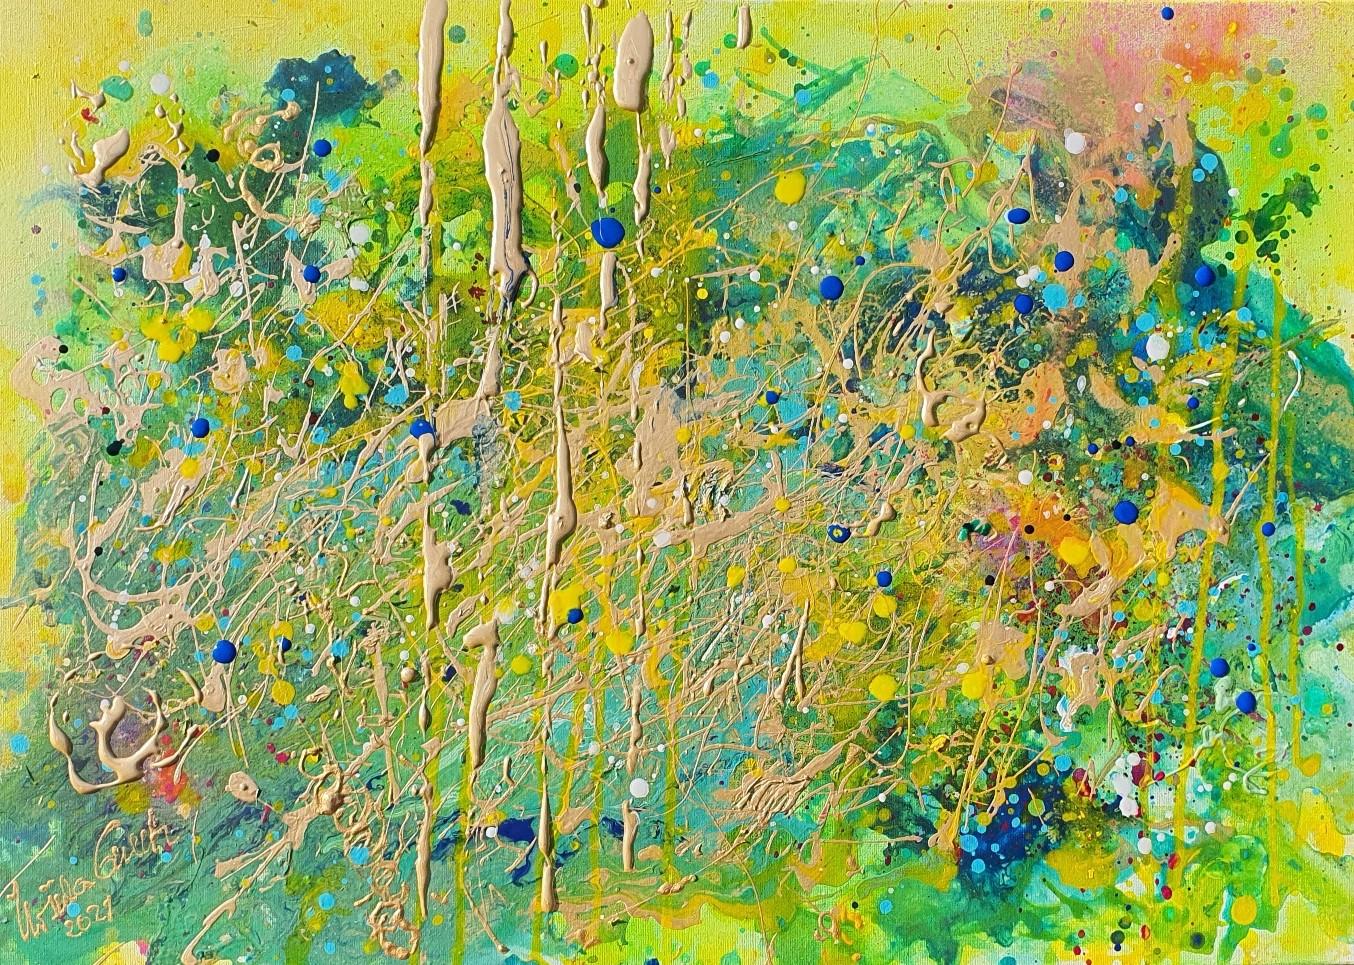 Summerfeeling 2021 (Technic: Acryl, Mixed Media on Canvas 70 X 50 X 1,5 cm)